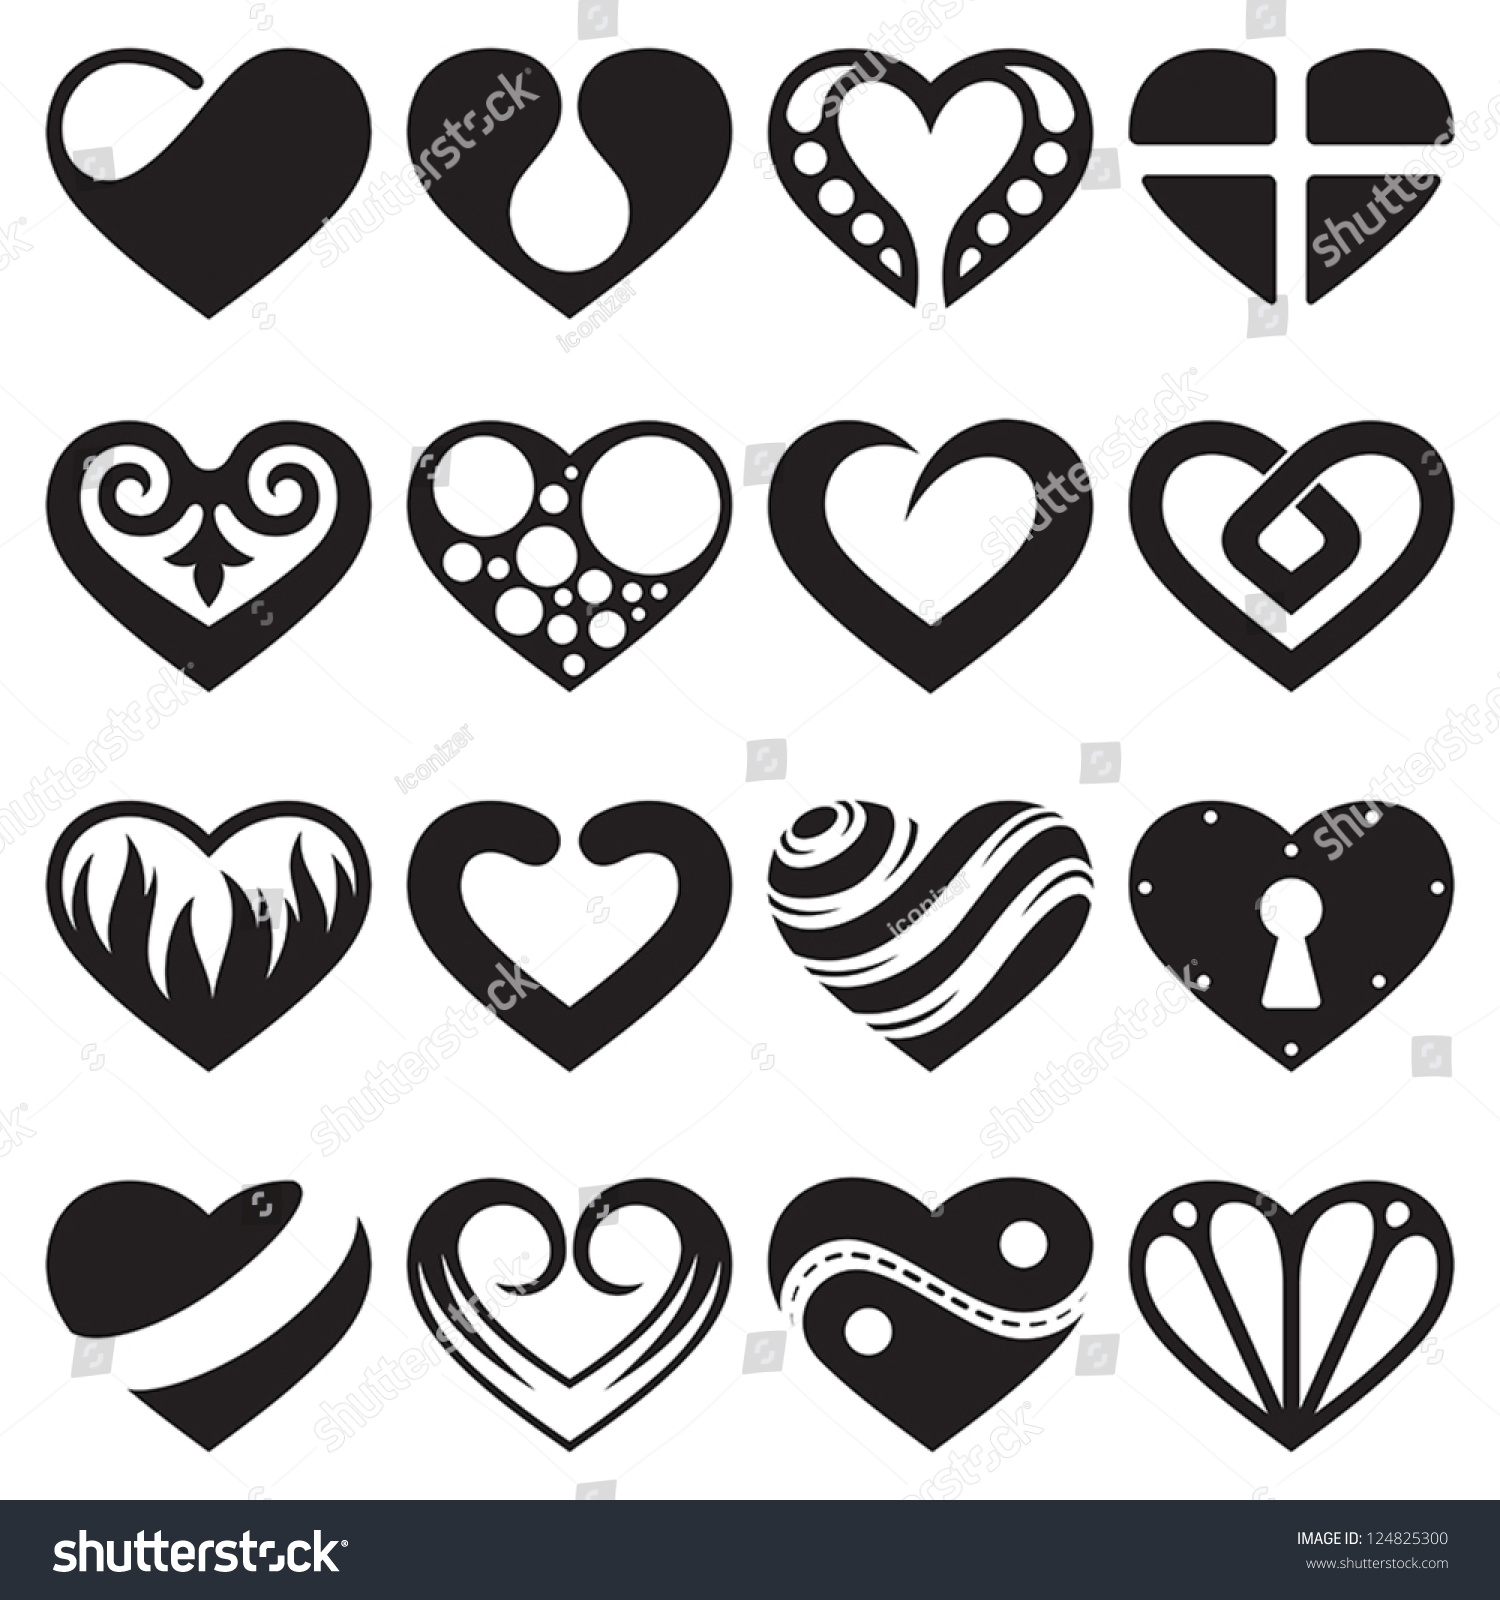 Heart Icons Signs Symbols Set Stock Vector Royalty Free 124825300